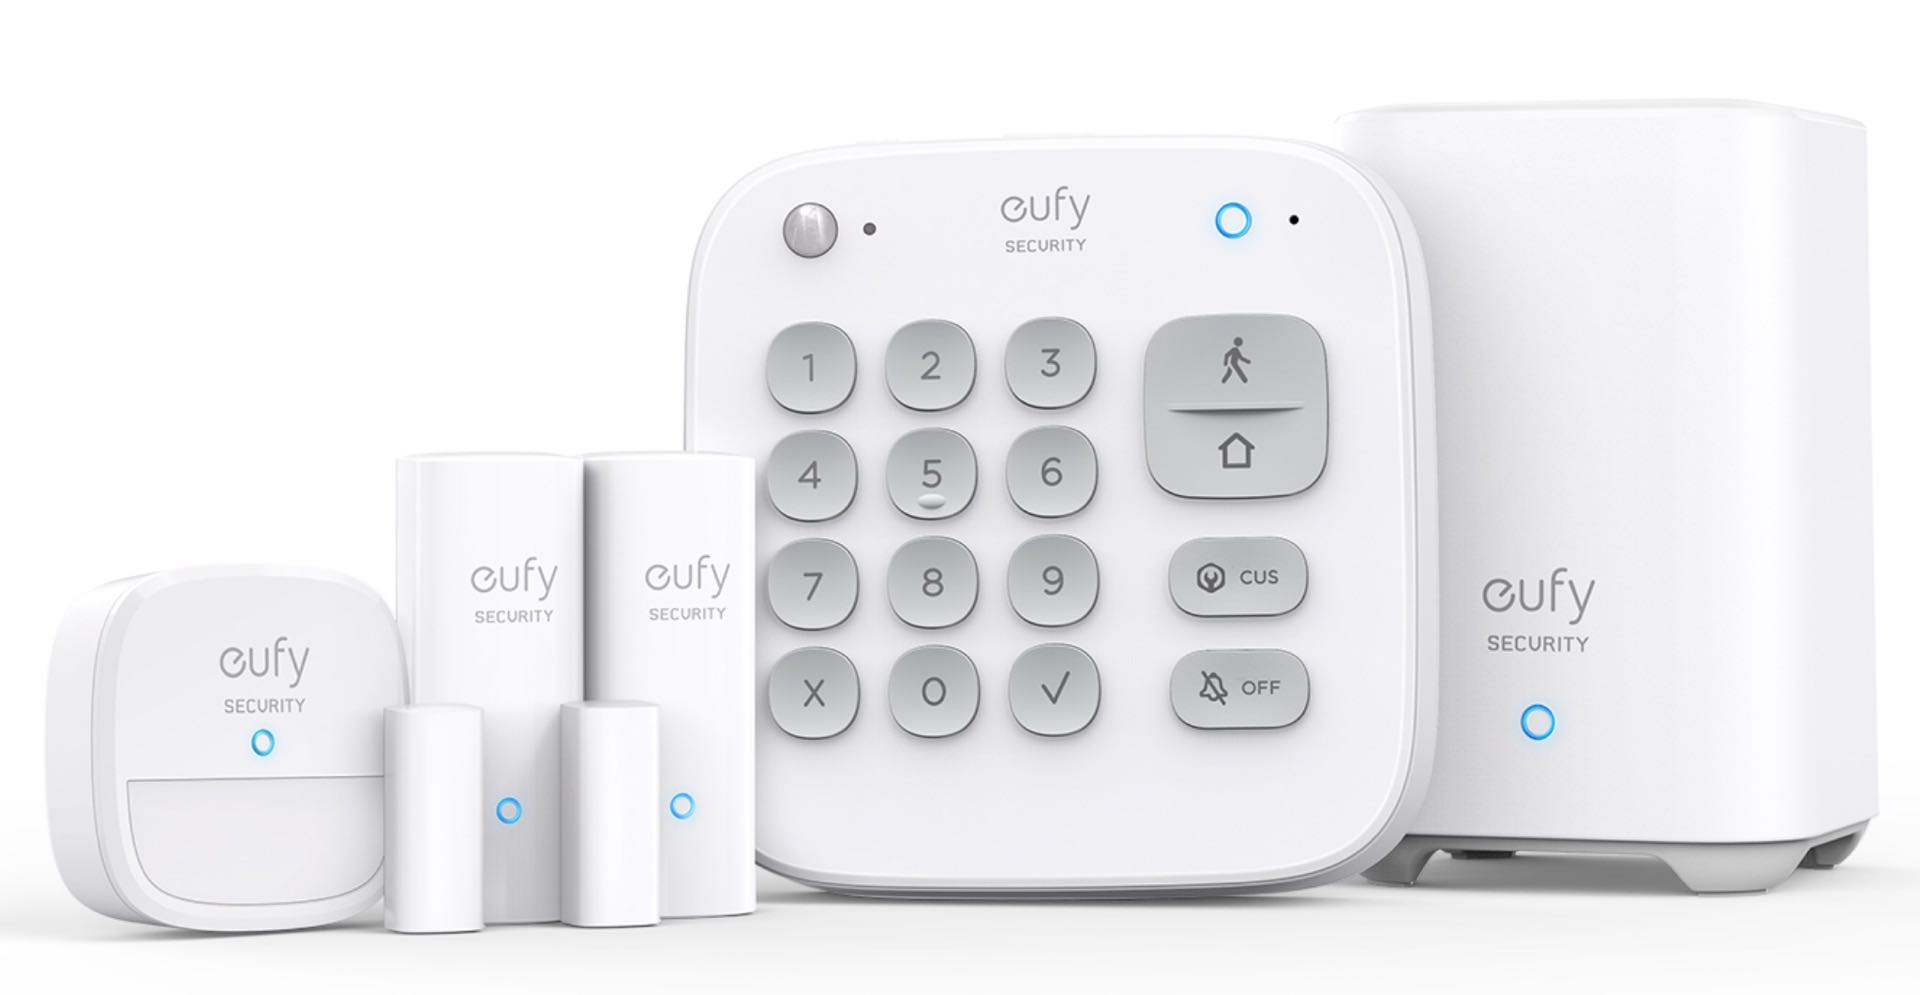 anker-eufy-security-5-piece-home-alarm-kit